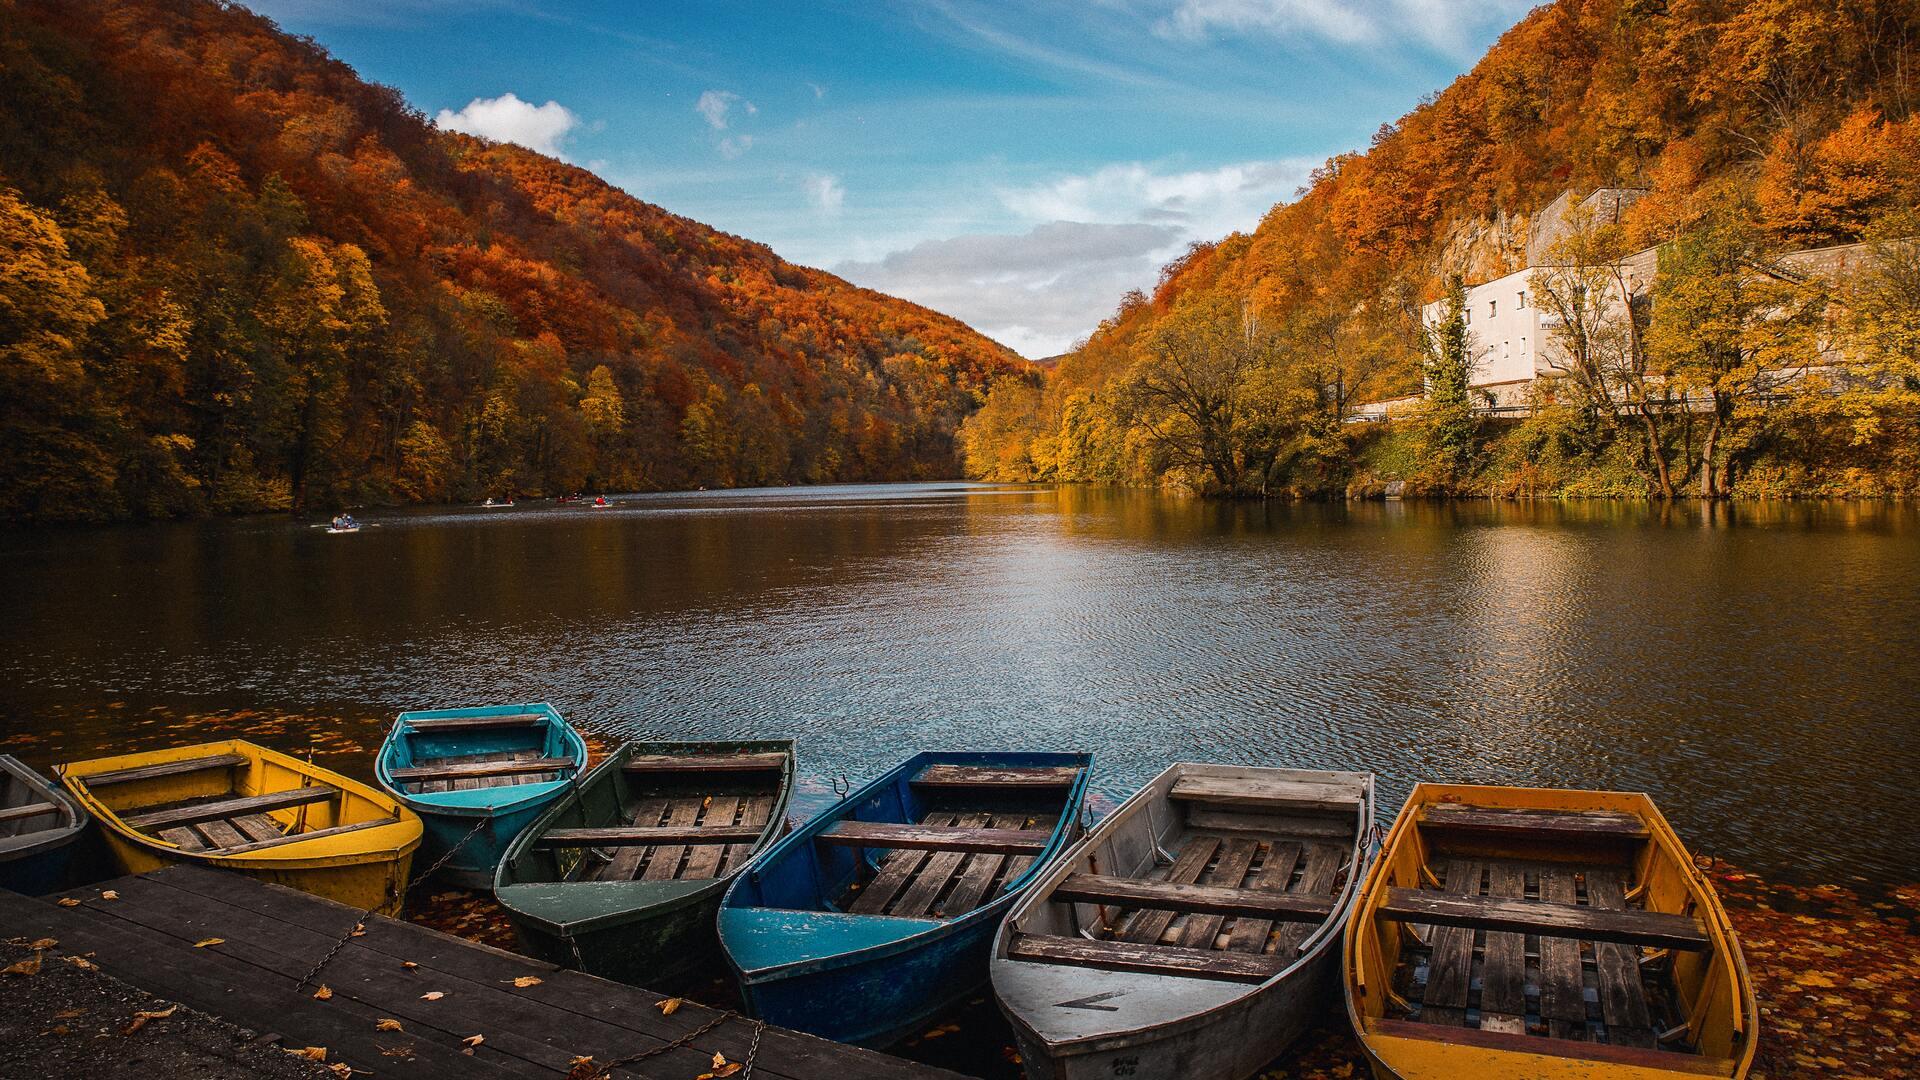 colored-row-boats-5k-74.jpg